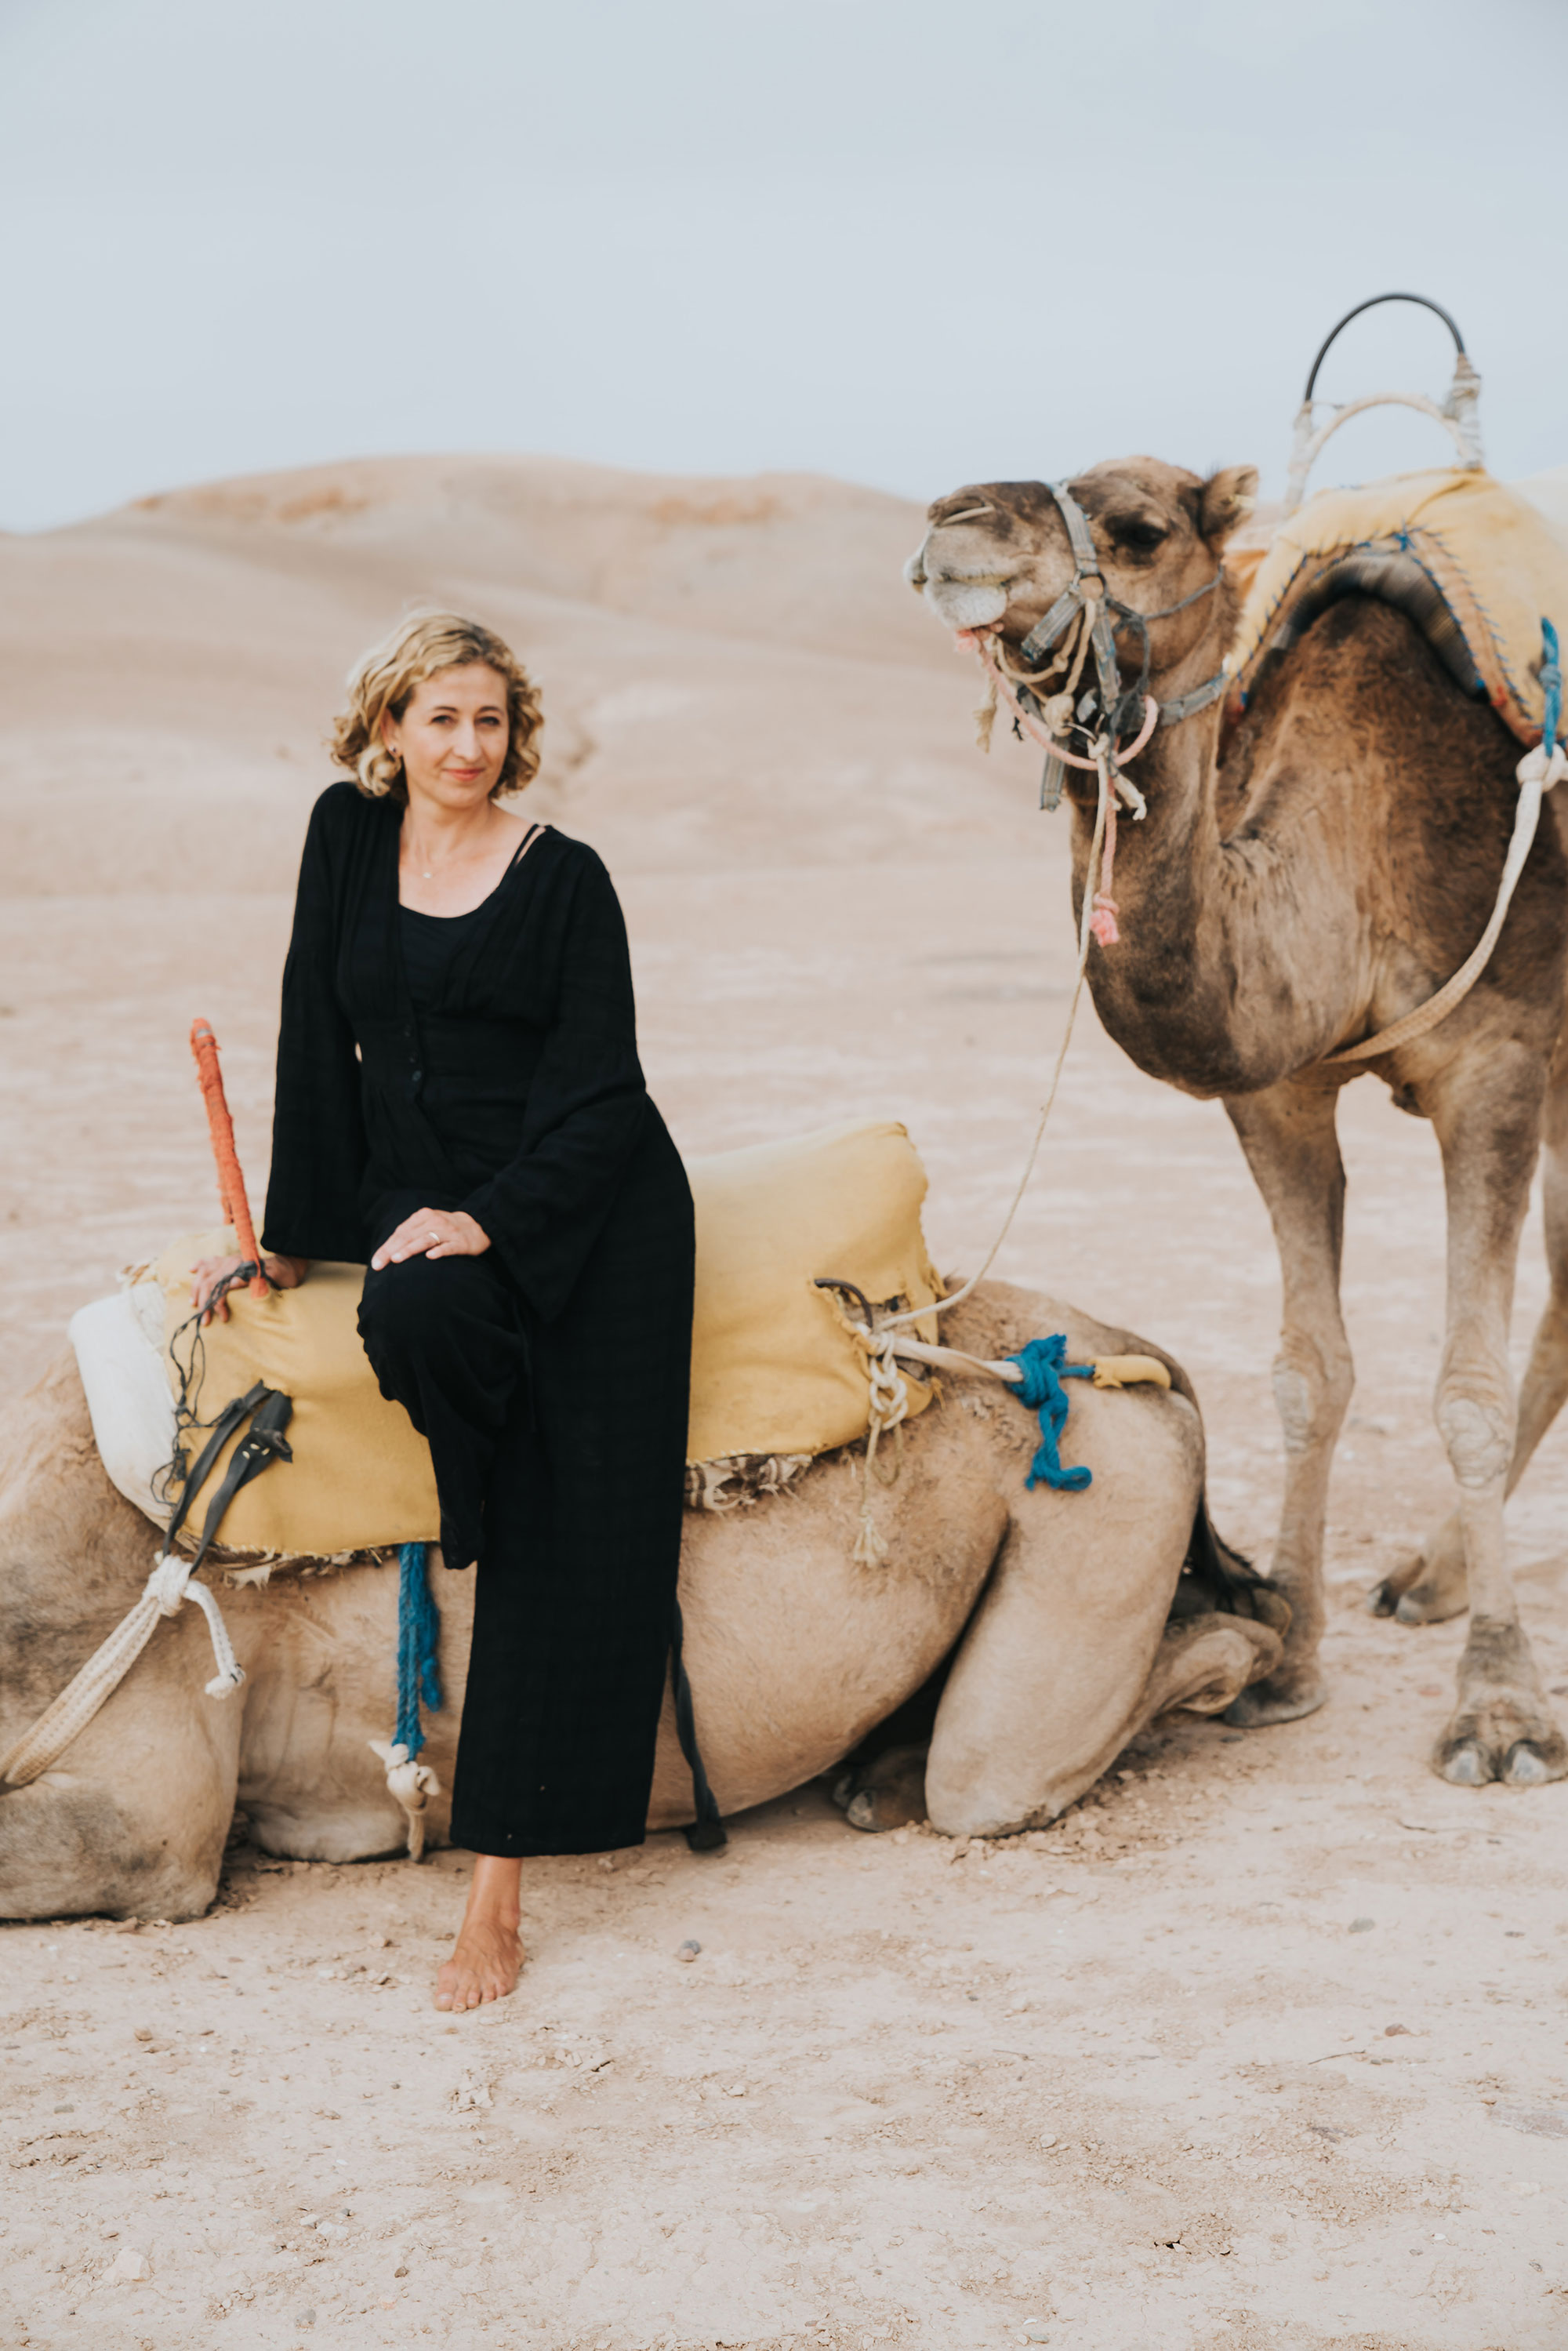 WE ARE Morocco Johanna Swanson Retreat